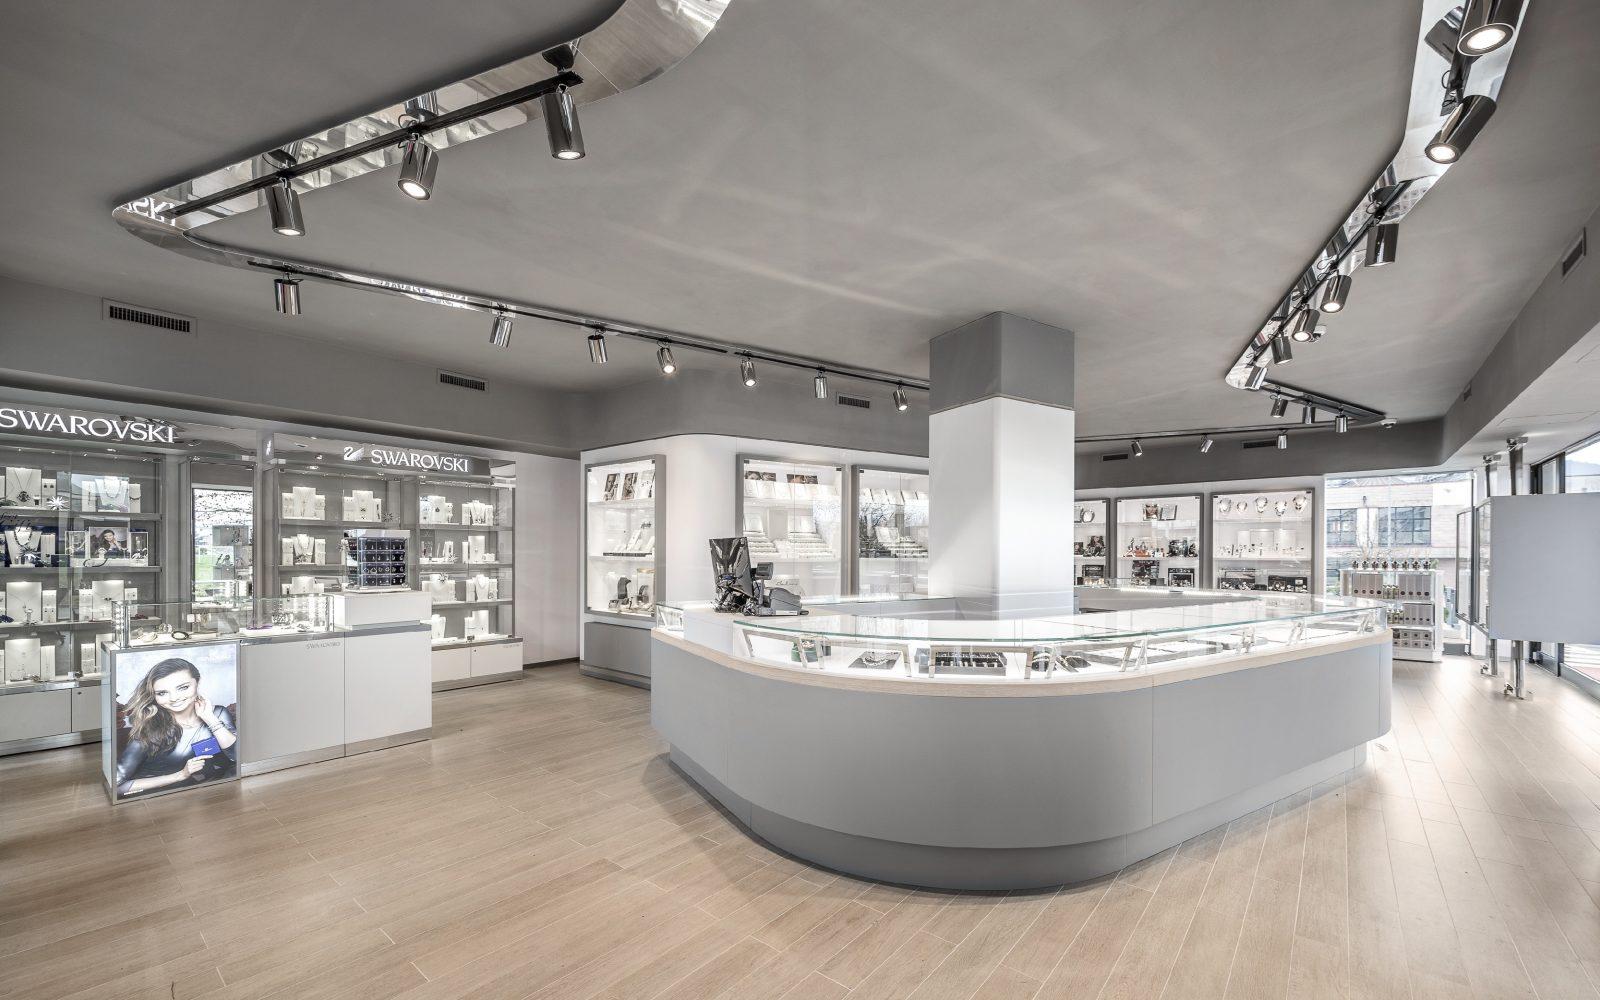 Inaugurates the new Cozzari Jewellery